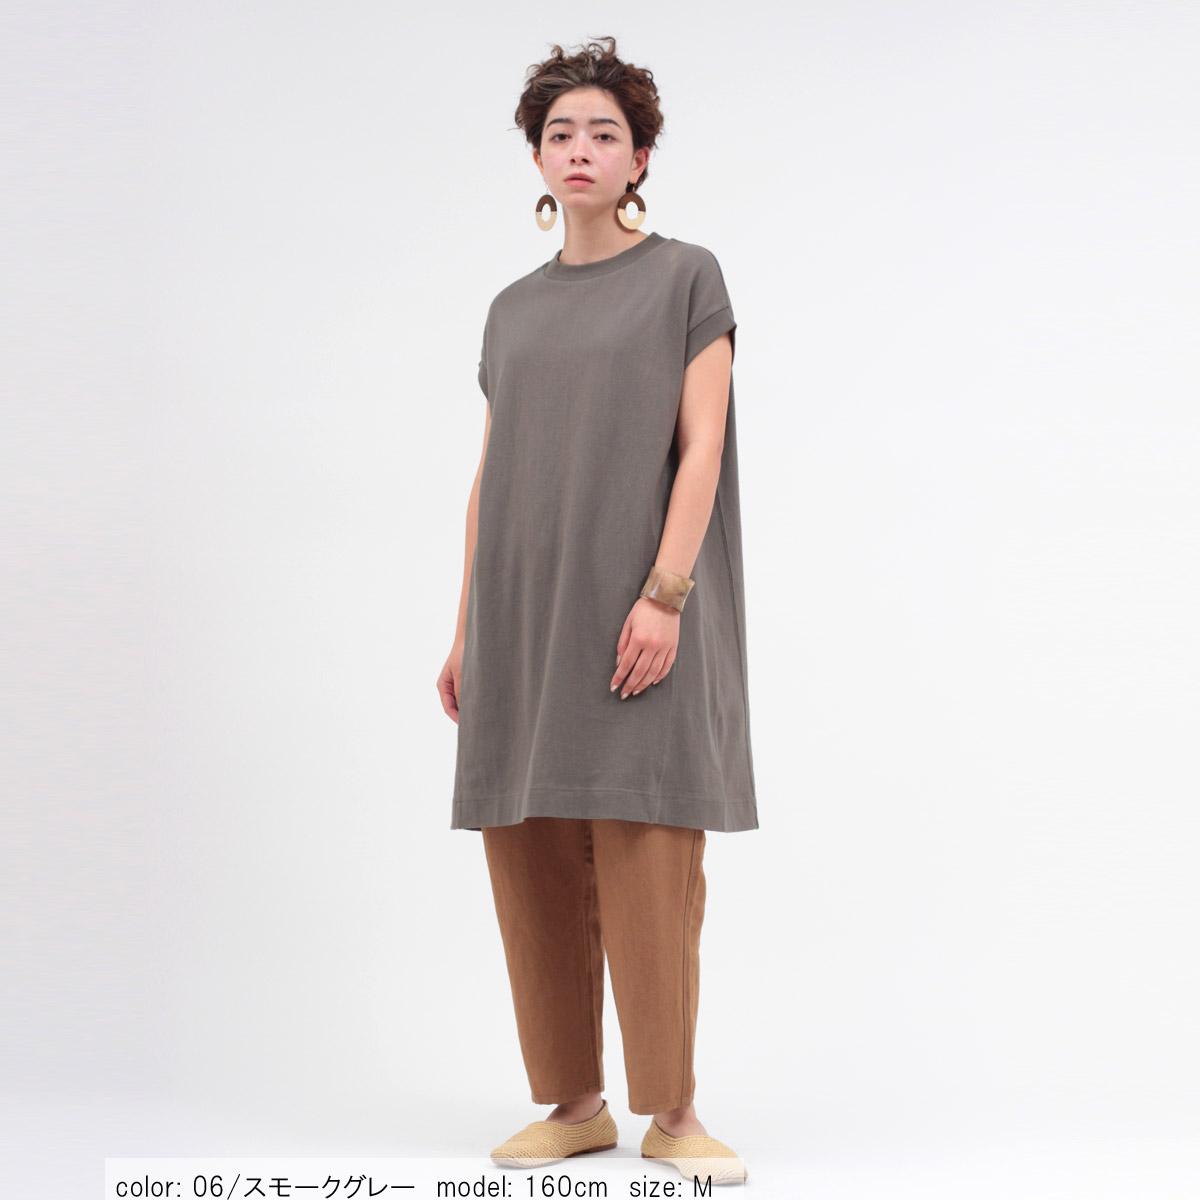 【PRE SALE】Cafetty フレンチスリーブチュニック CF6038